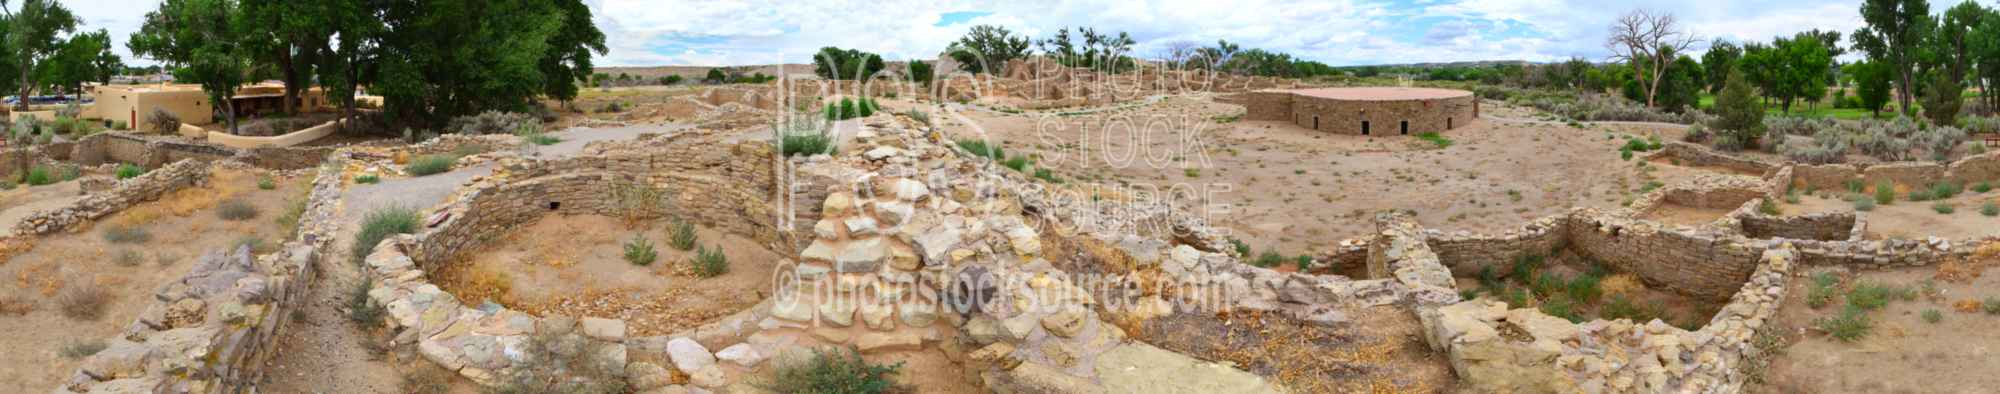 Aztec Ruins Great Kiva